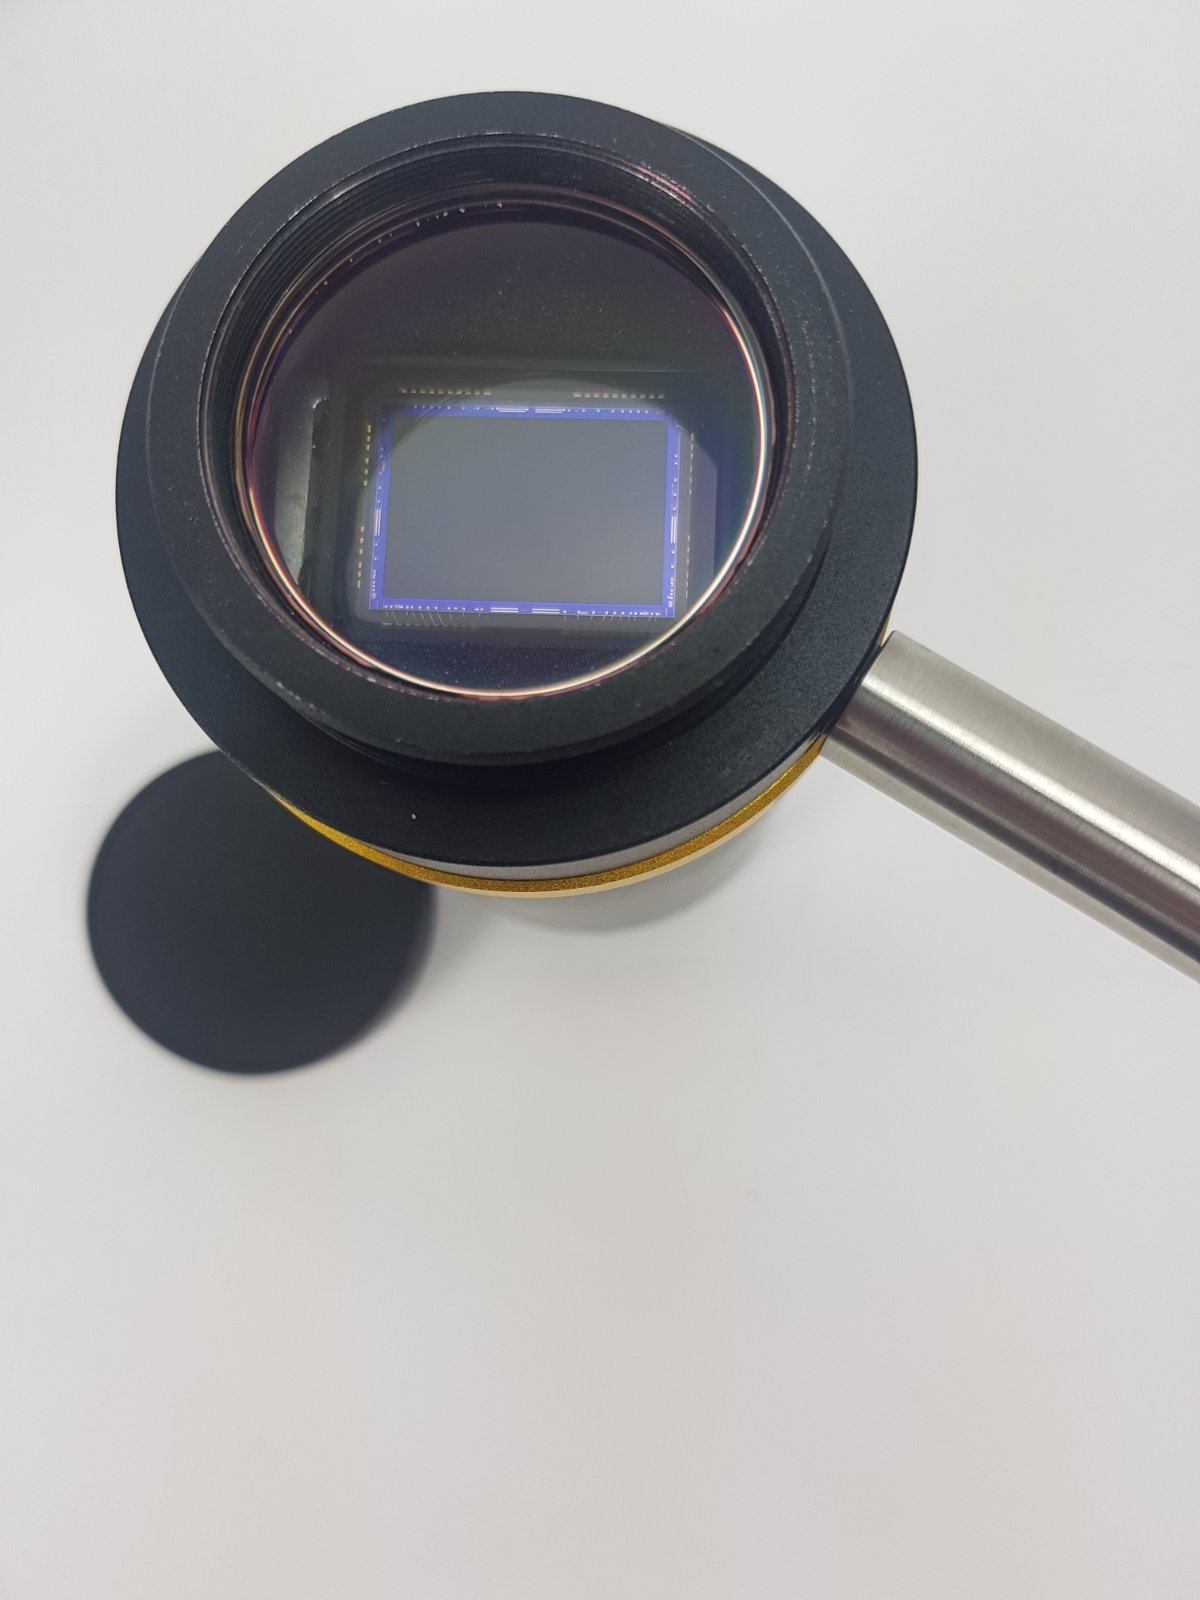 Camera CCD a colori QHY10 da 10Mpx, raffreddata a -35° - Usata, dotazione originale